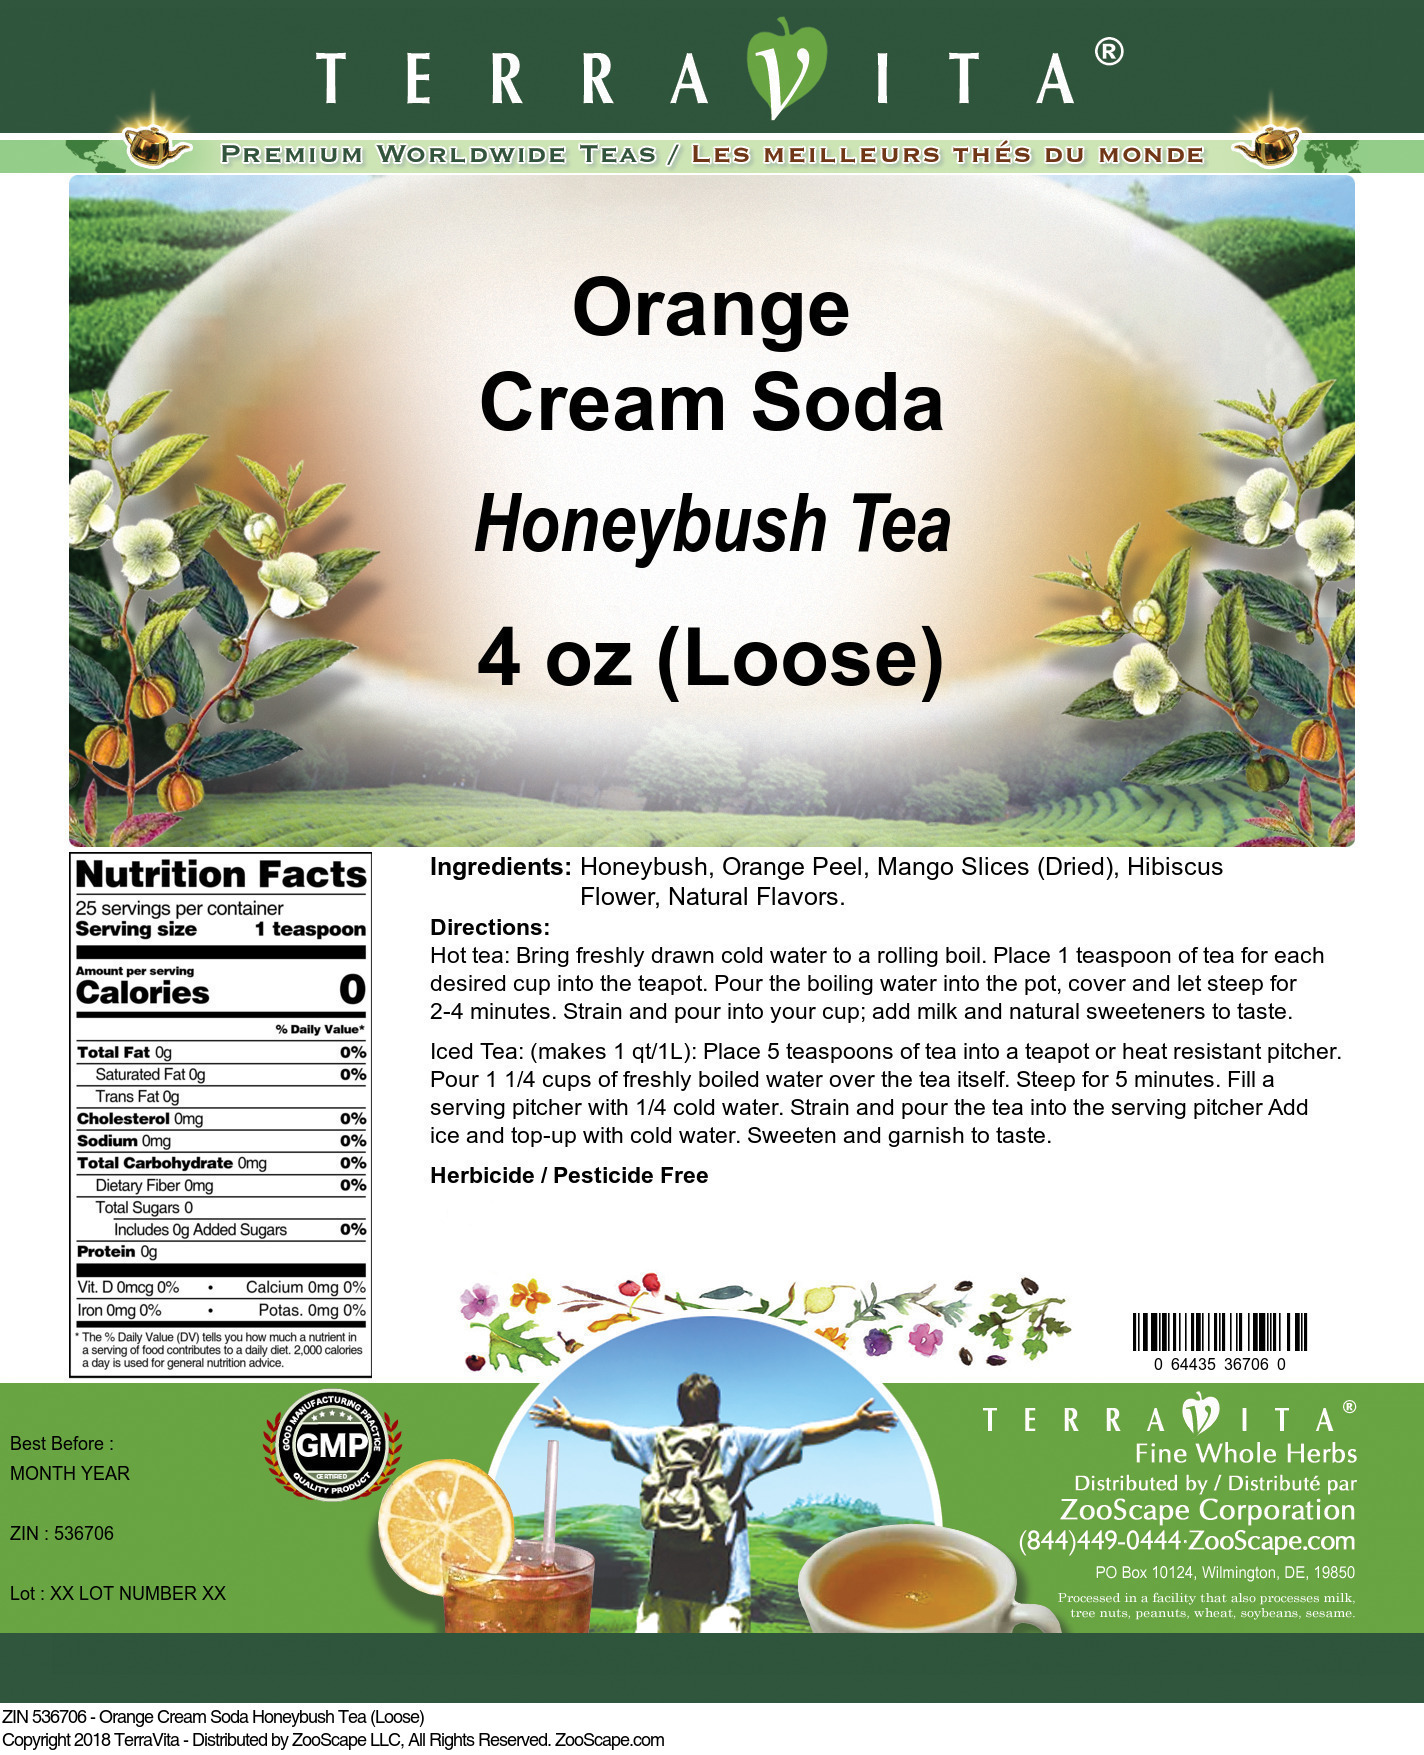 Orange Cream Soda Honeybush Tea (Loose)